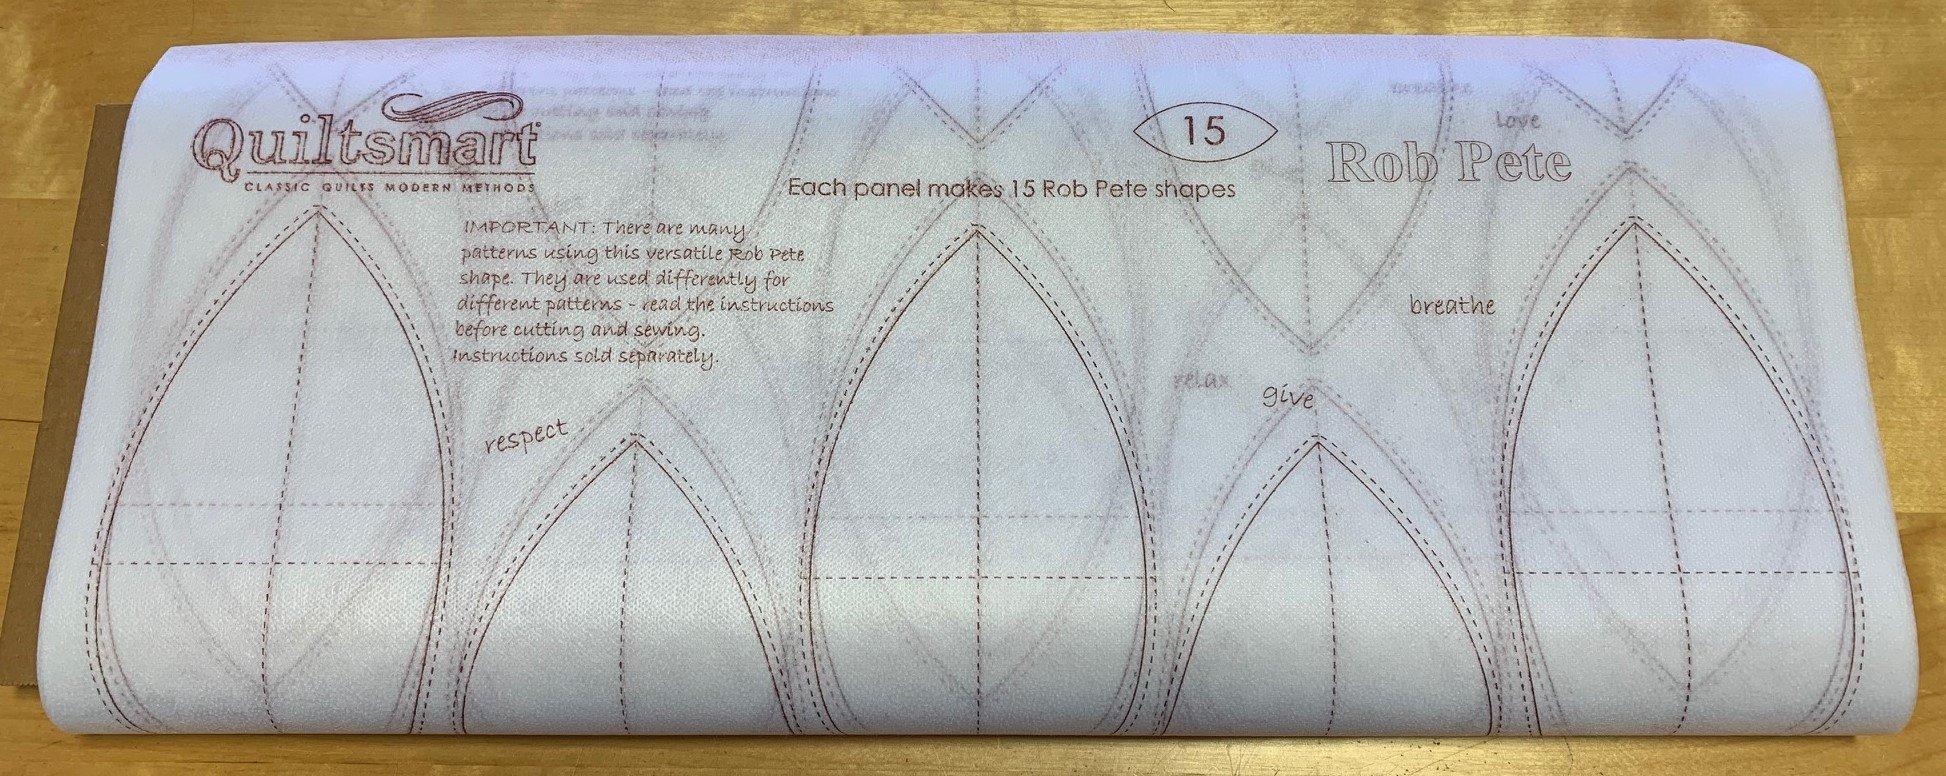 Rob Pete Printed Interfacing 25-panel Bolt